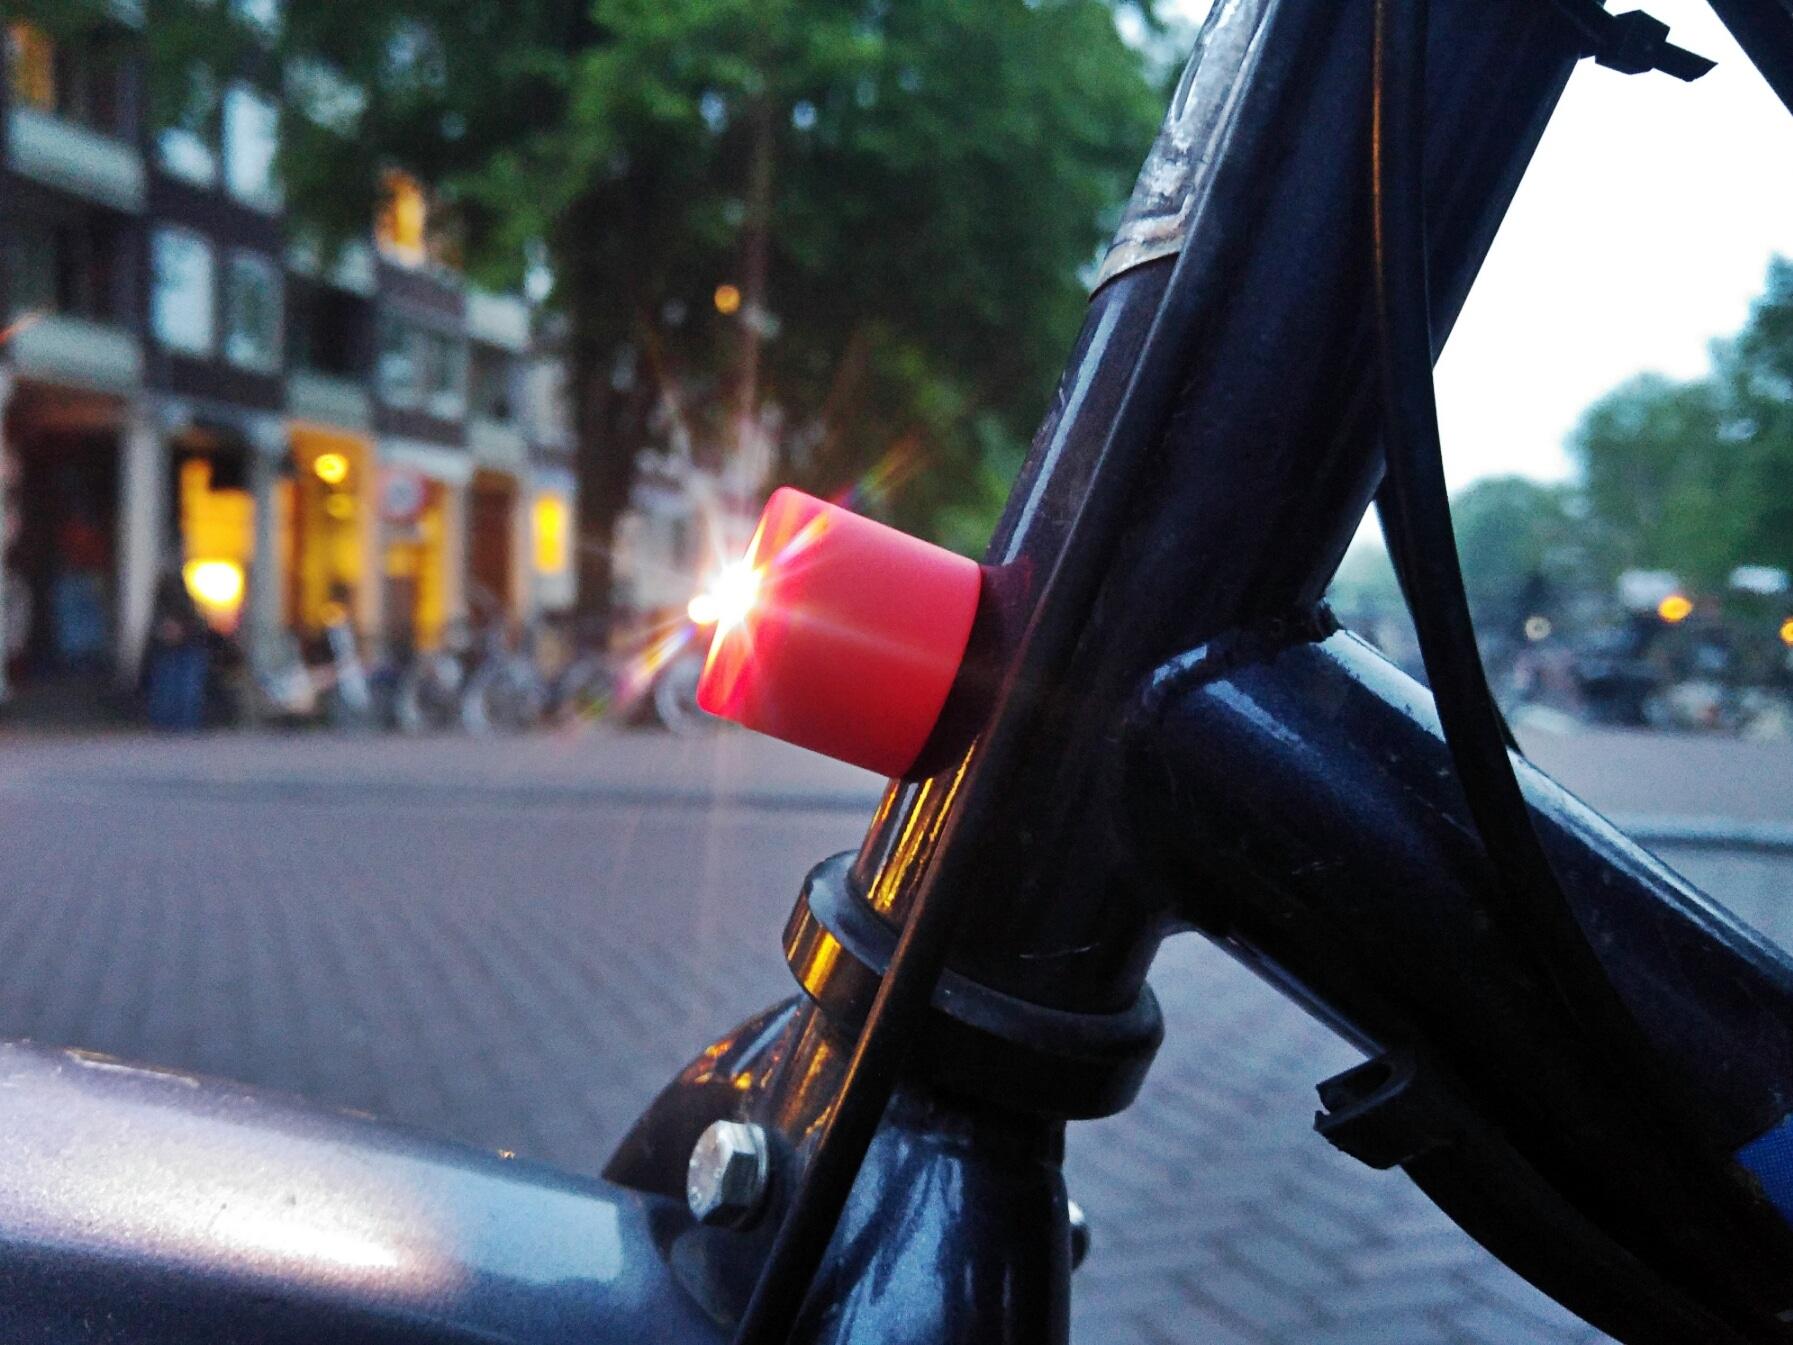 magnetic bike light in action